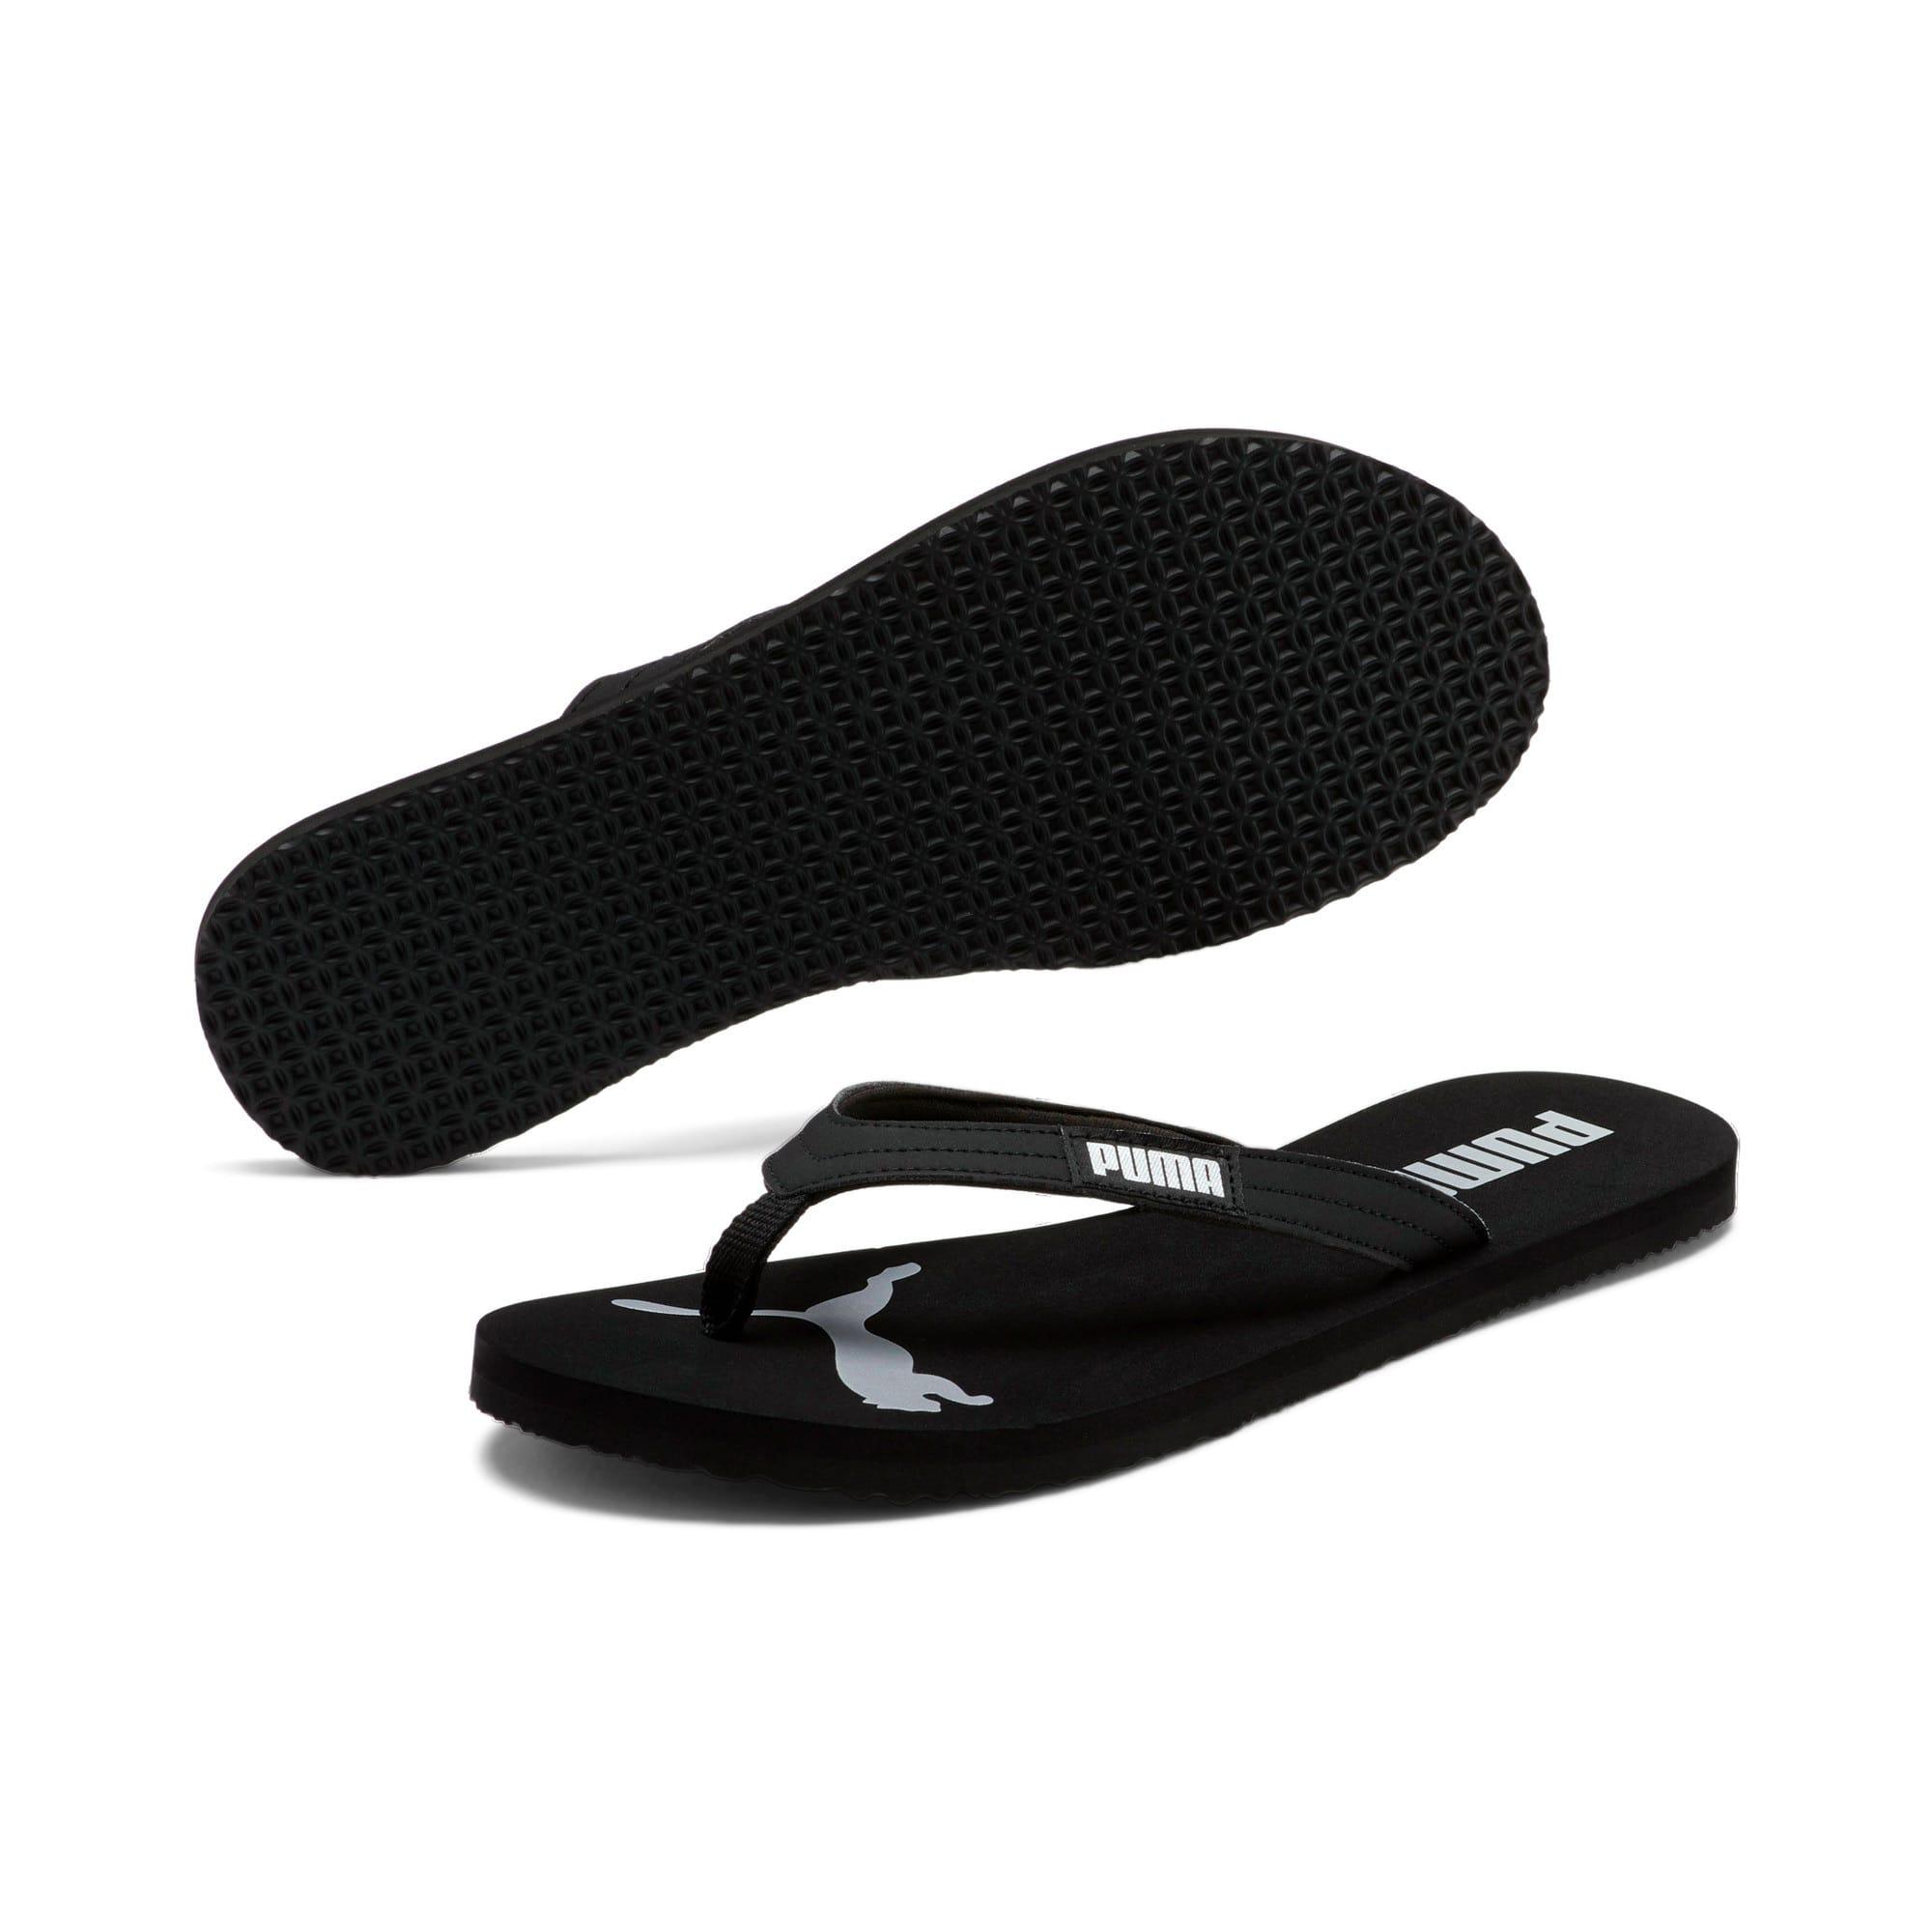 Thumbnail 2 of PUMA Cozy Flip Women's Sandals, Puma Black-Puma Silver, medium